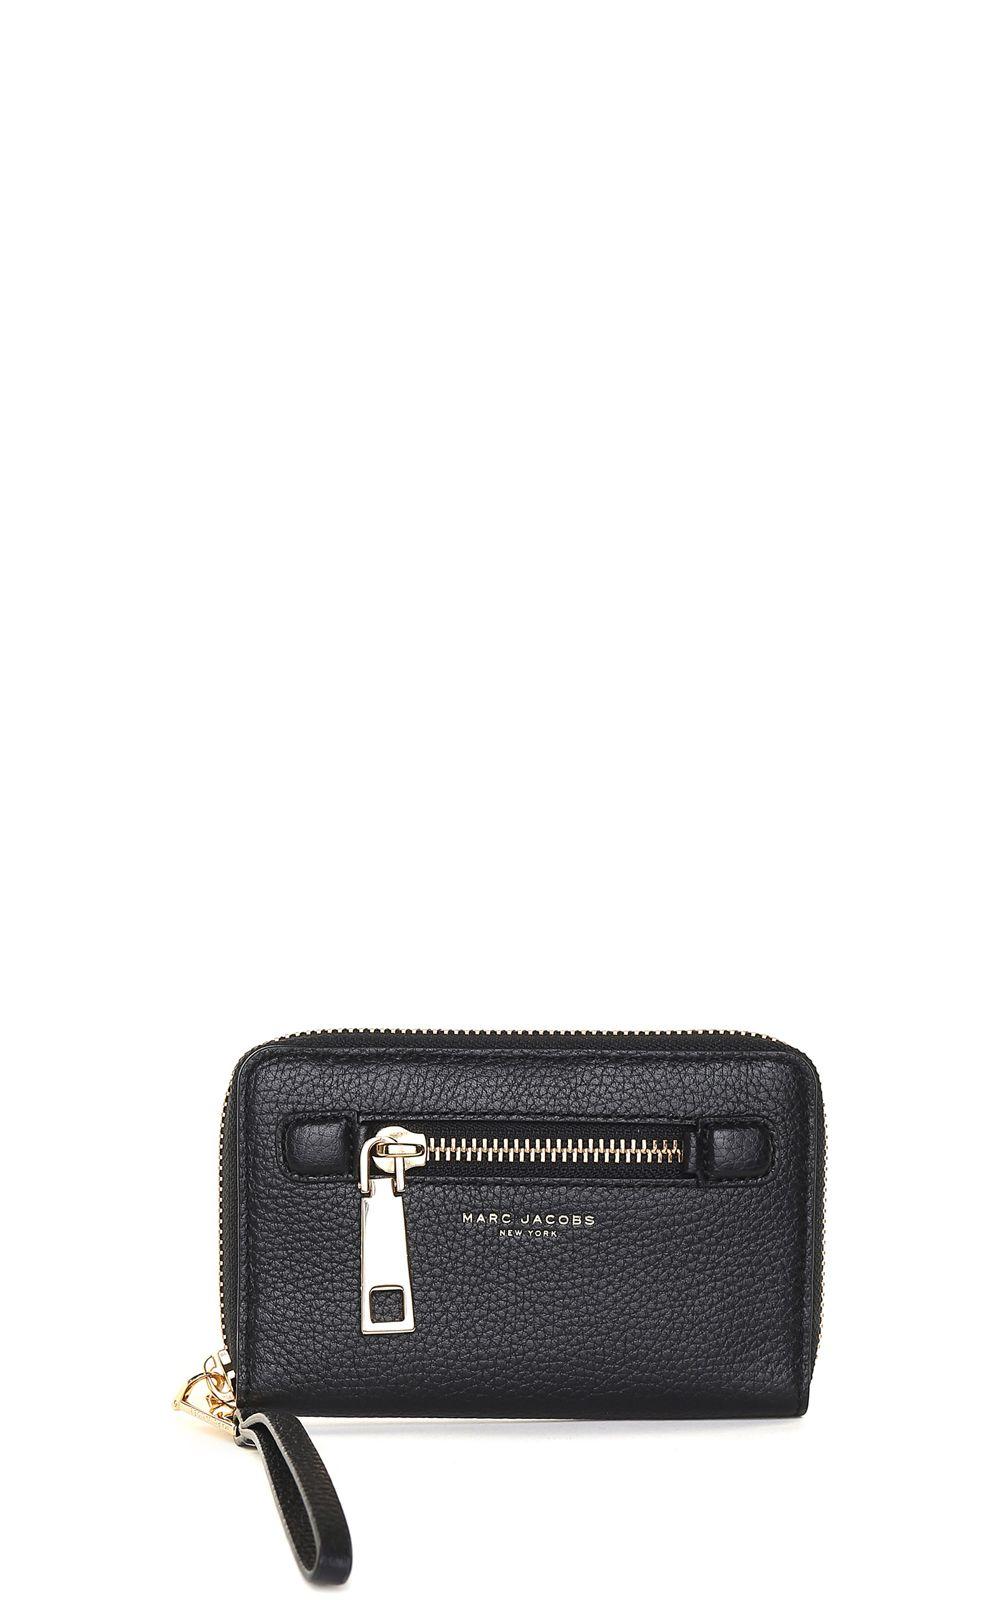 Marc Jacobs Gotham Zip Phone Wristlet Grained-leather Wallet